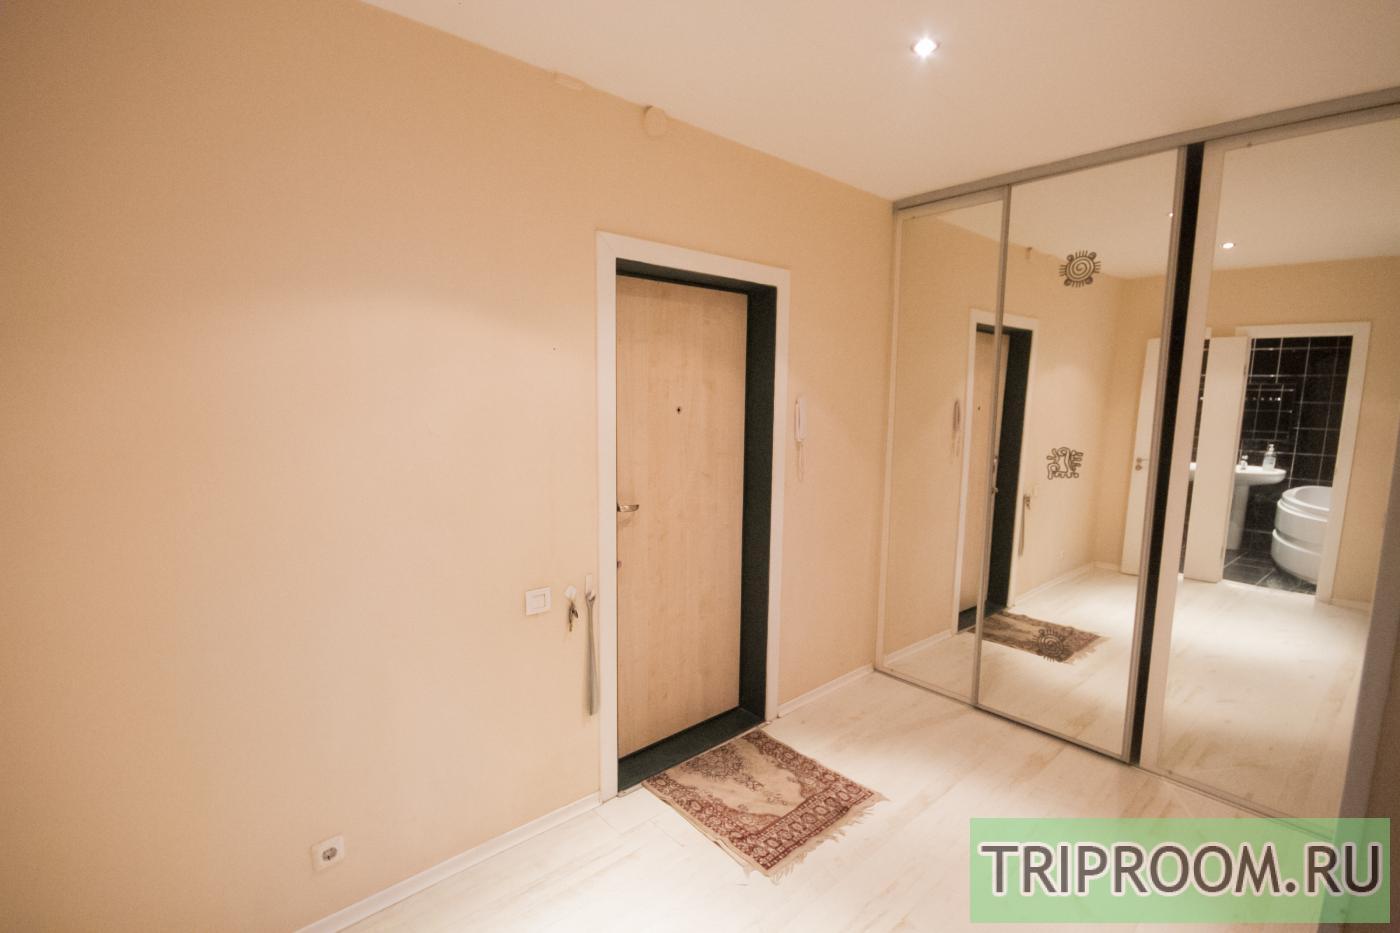 1-комнатная квартира посуточно (вариант № 4341), ул. Галущака, фото № 15